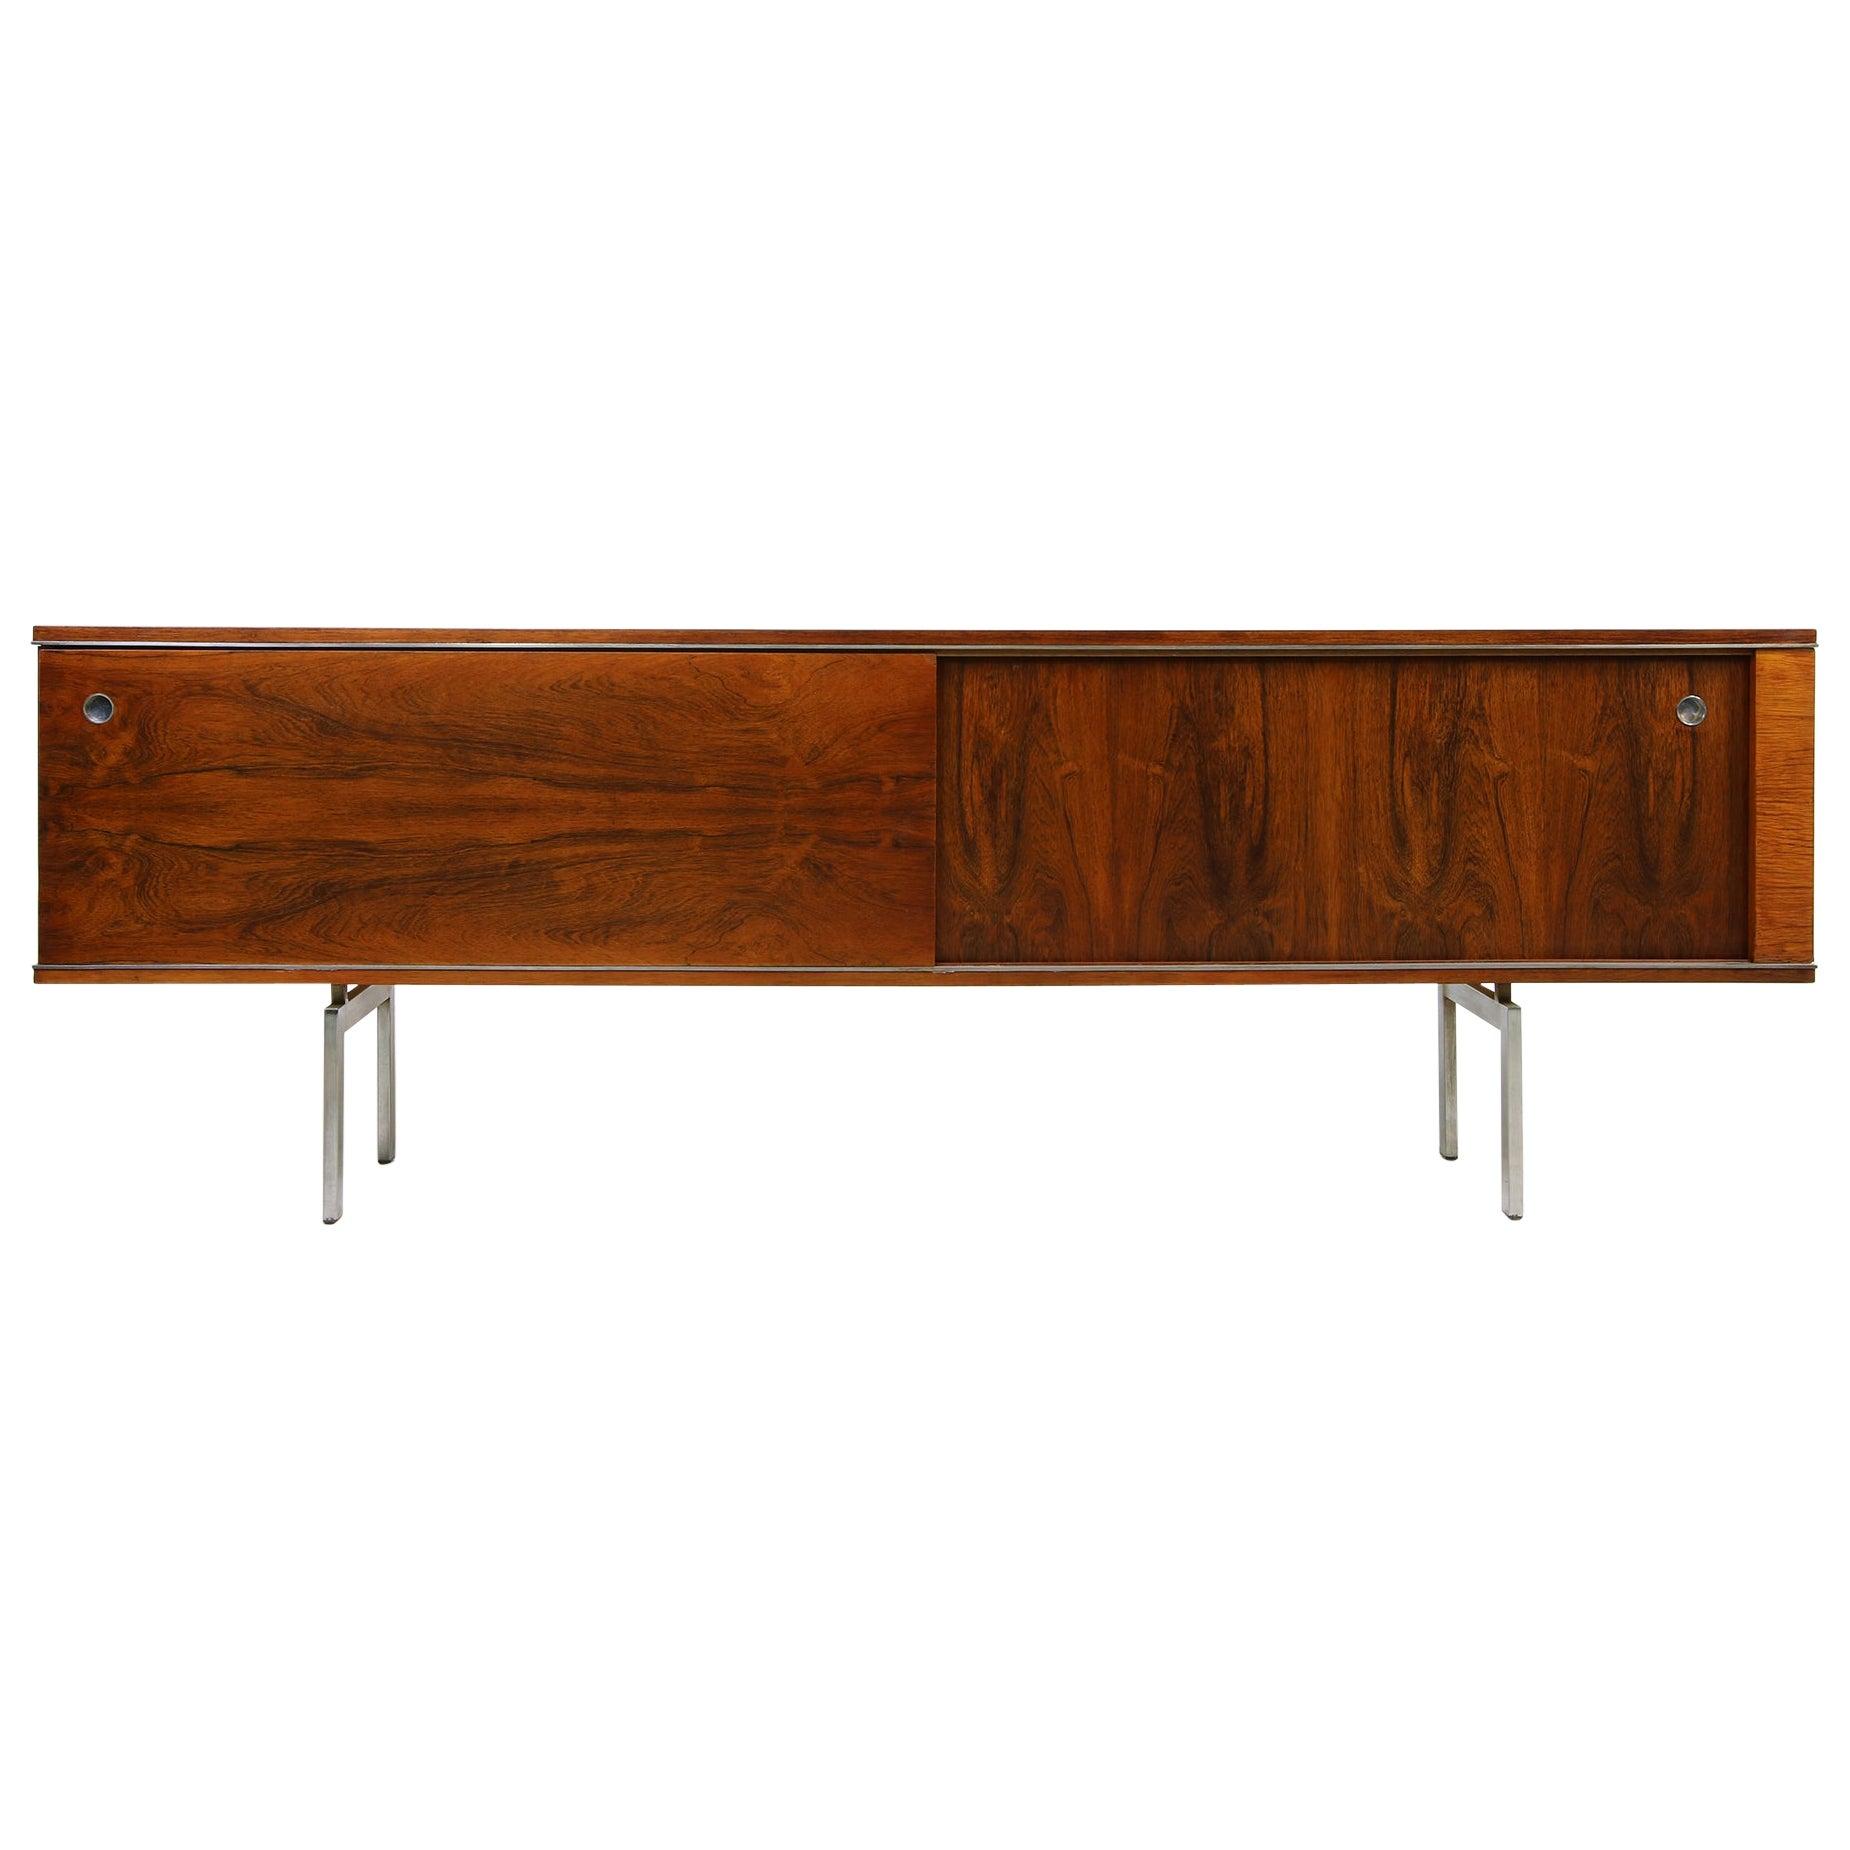 Large Vintage 1960s Sideboard Credenza, Belgium, Reversible Doors, Metal Base